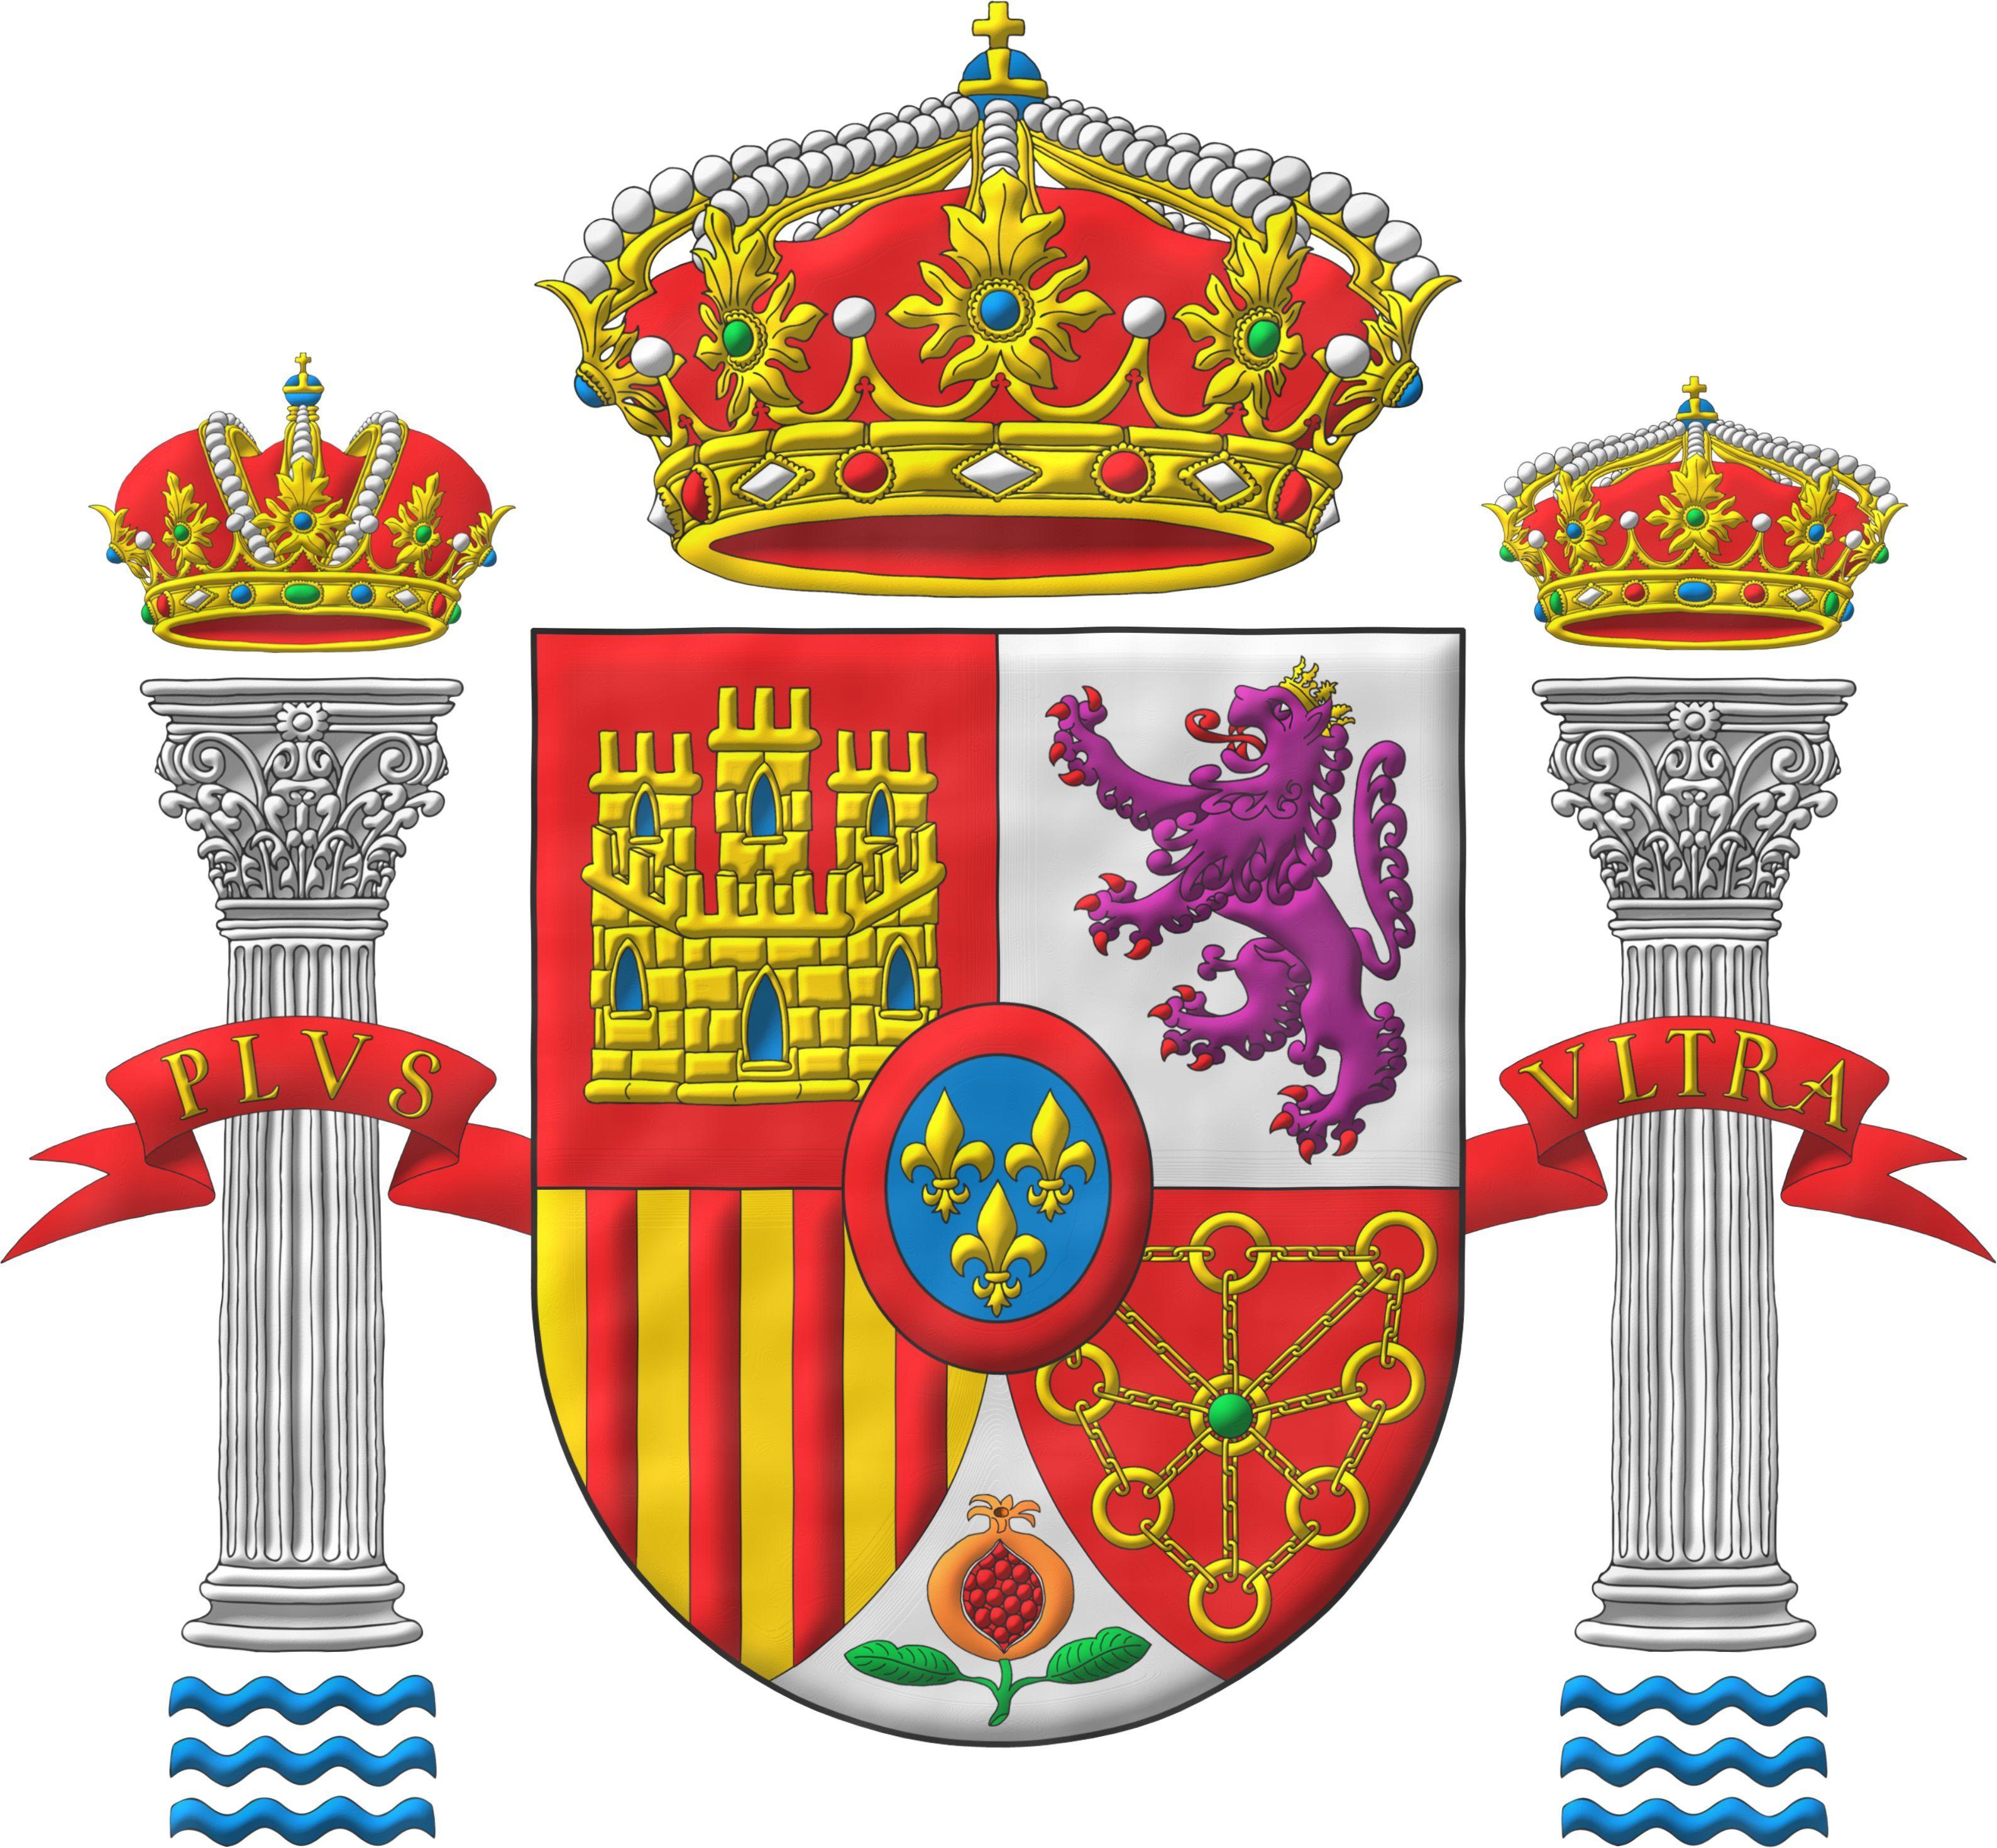 Escudo de espa a clipart png black and white download España; Escudo del Reino de España; Escudo de España   Heráldica ... png black and white download